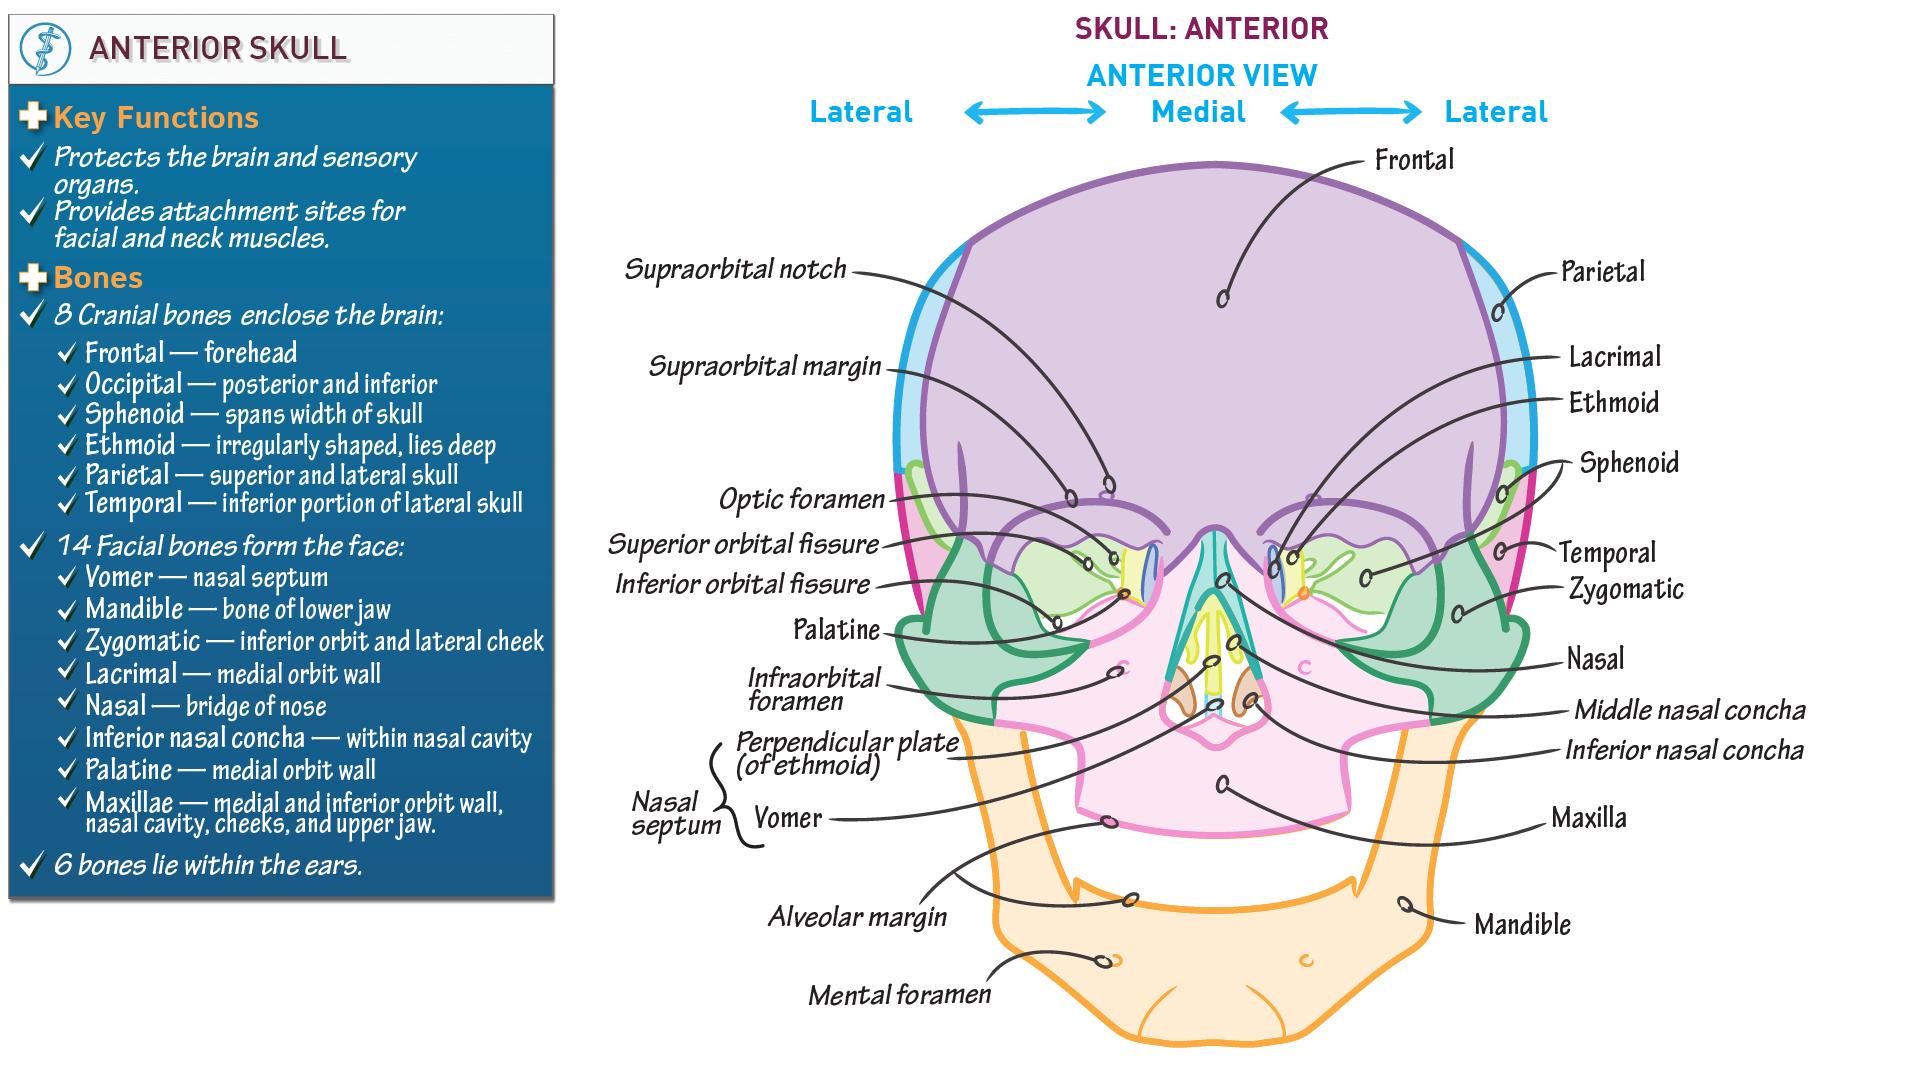 Anterior Skull Base Anatomy Images - human body anatomy